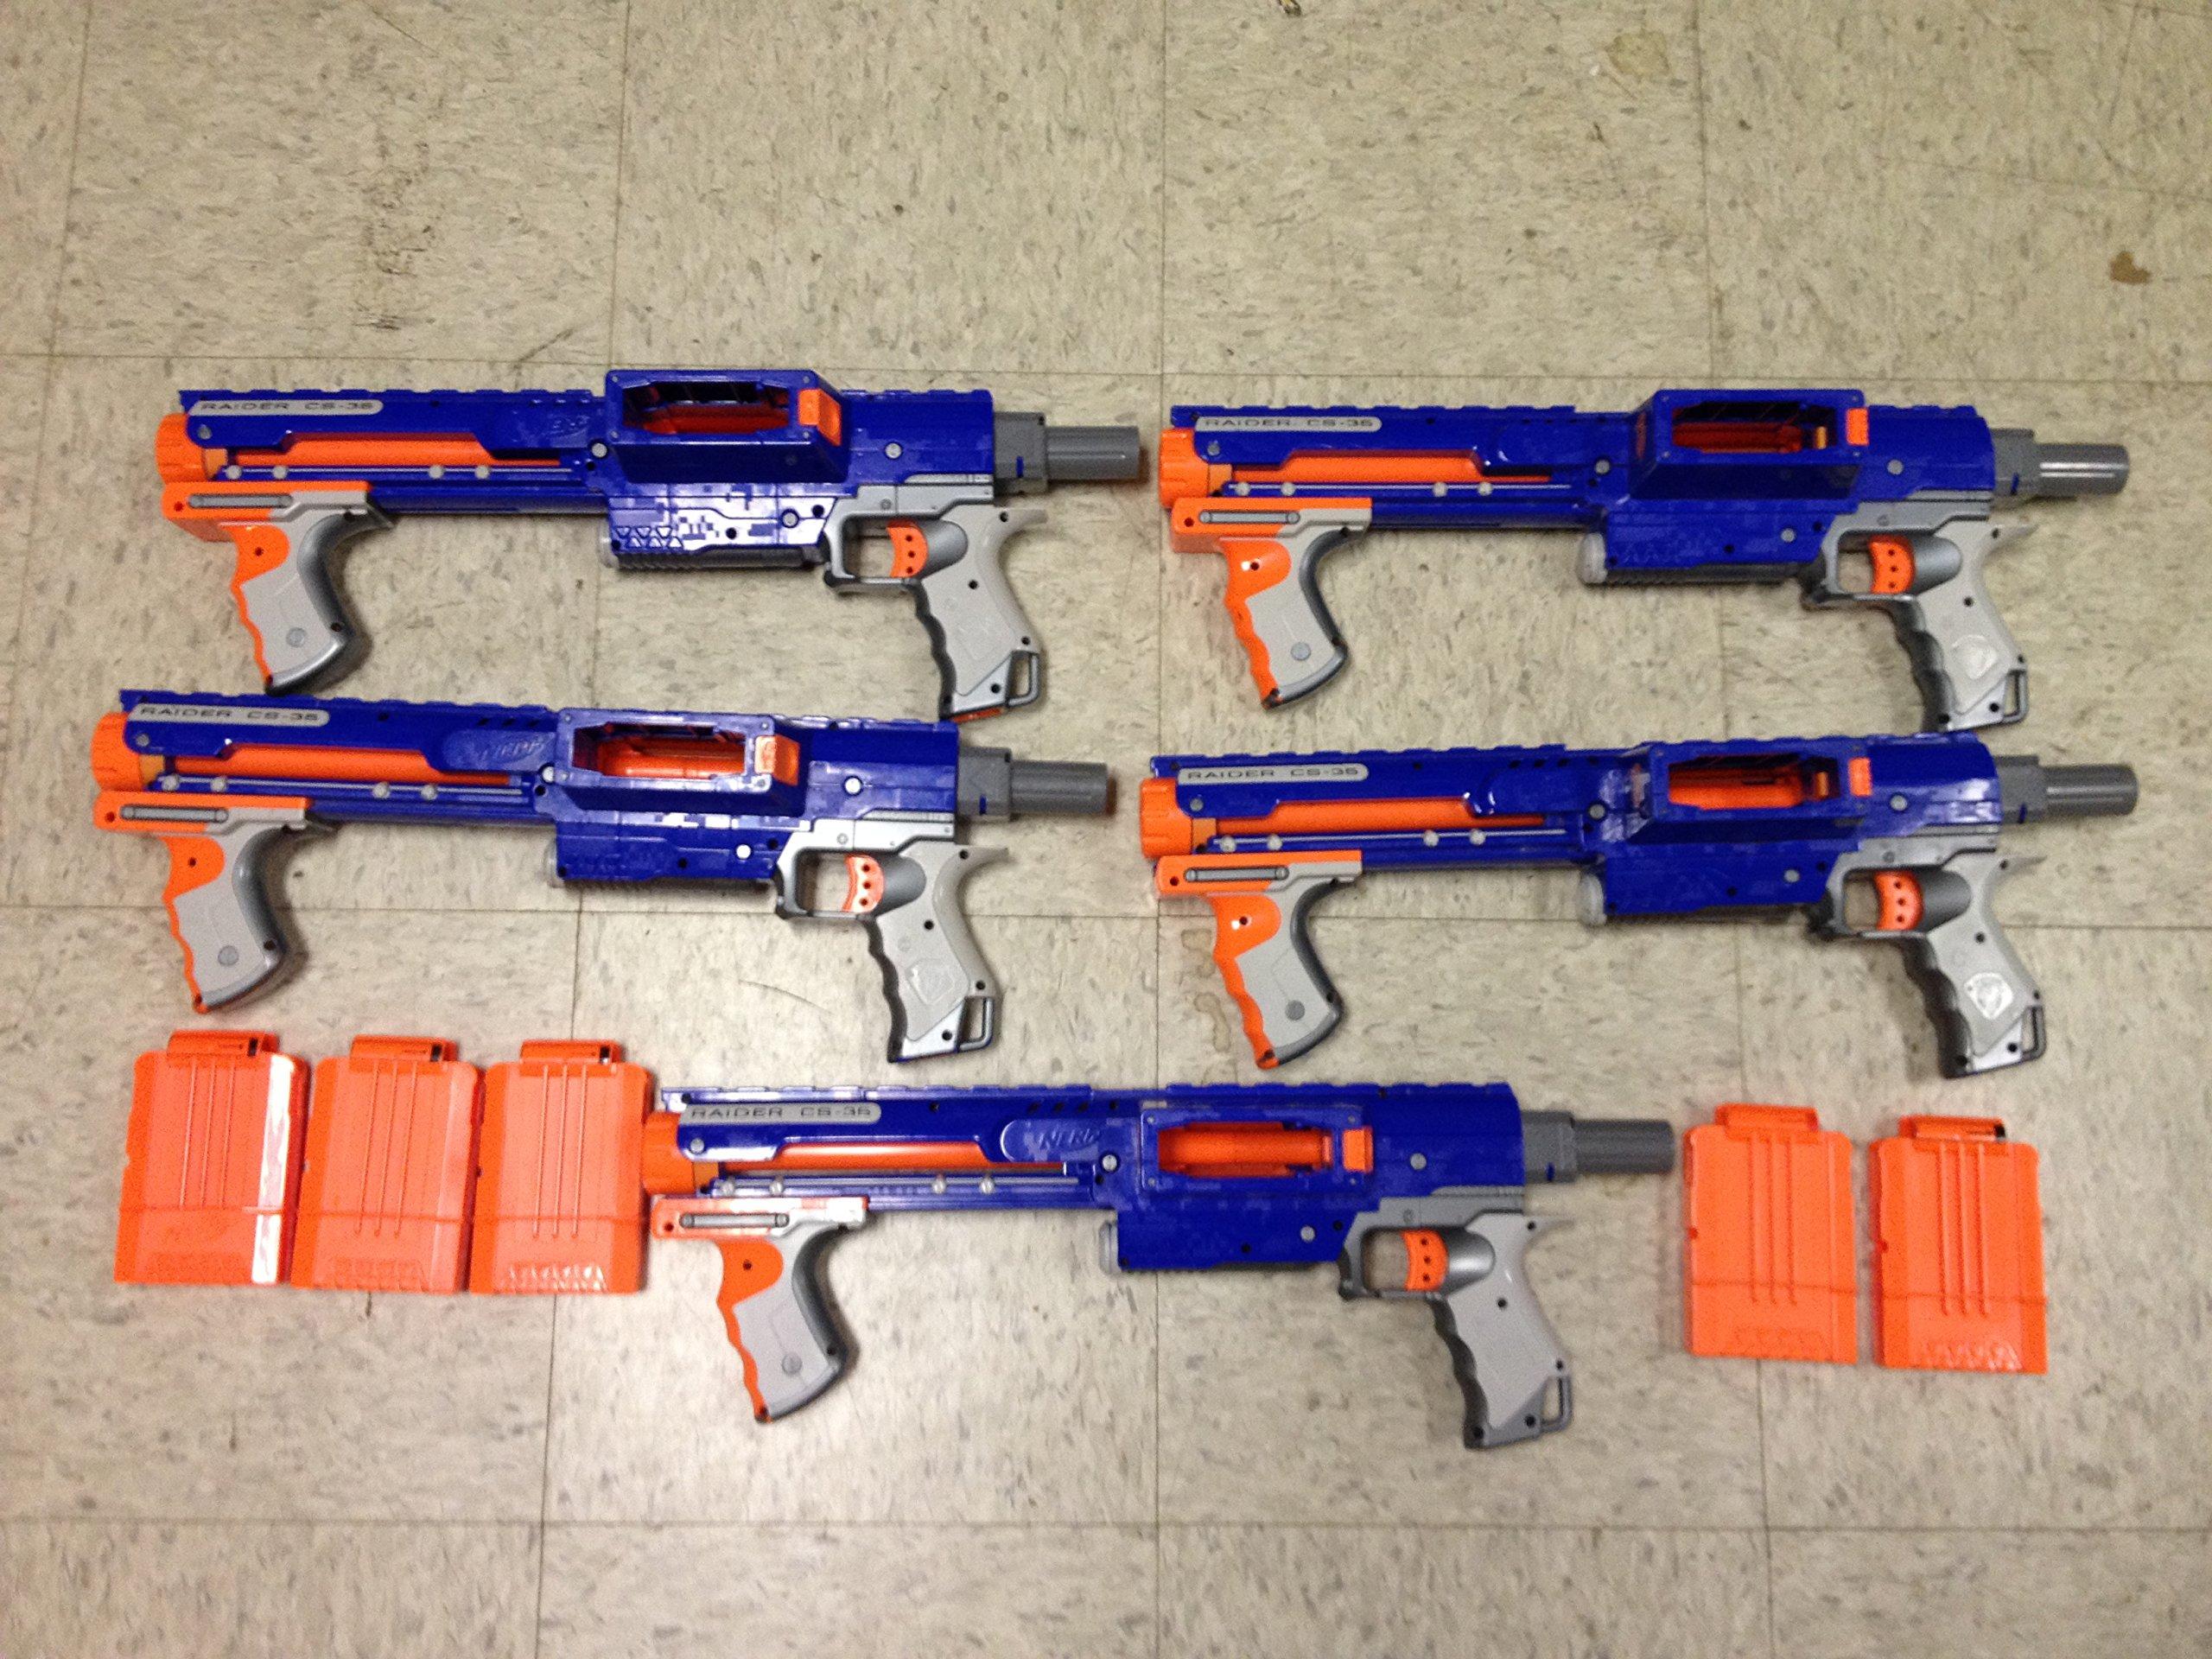 Nerf N-Strike Raider Rapid Fire CS-35 Dart Blaster (Includes 5 guns w 5 ammo clips)